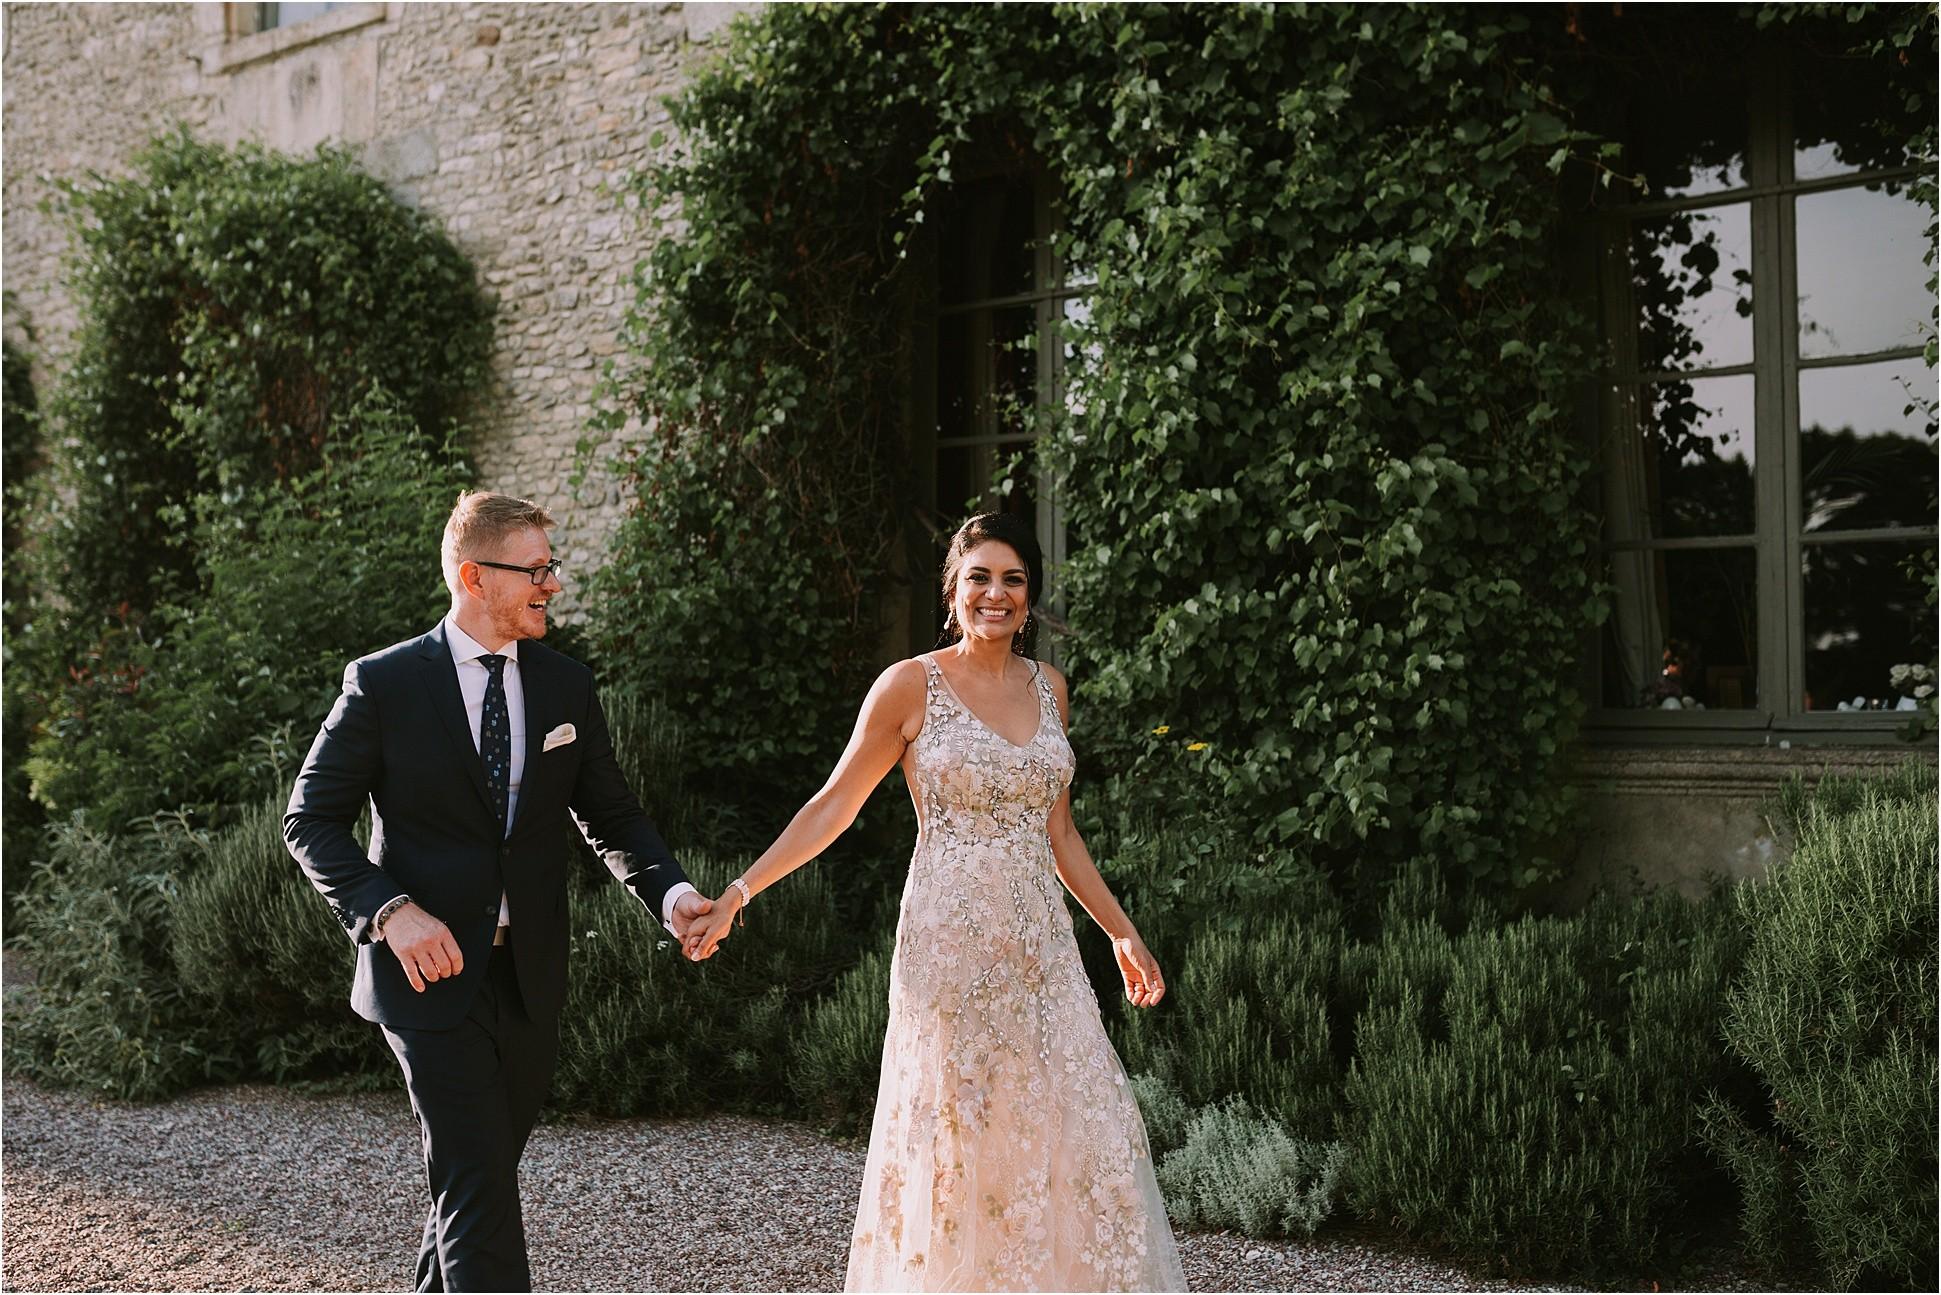 Kateryna-photos-photographe-mariage-chateau-st-paterne-mayenne-normandie_0184.jpg